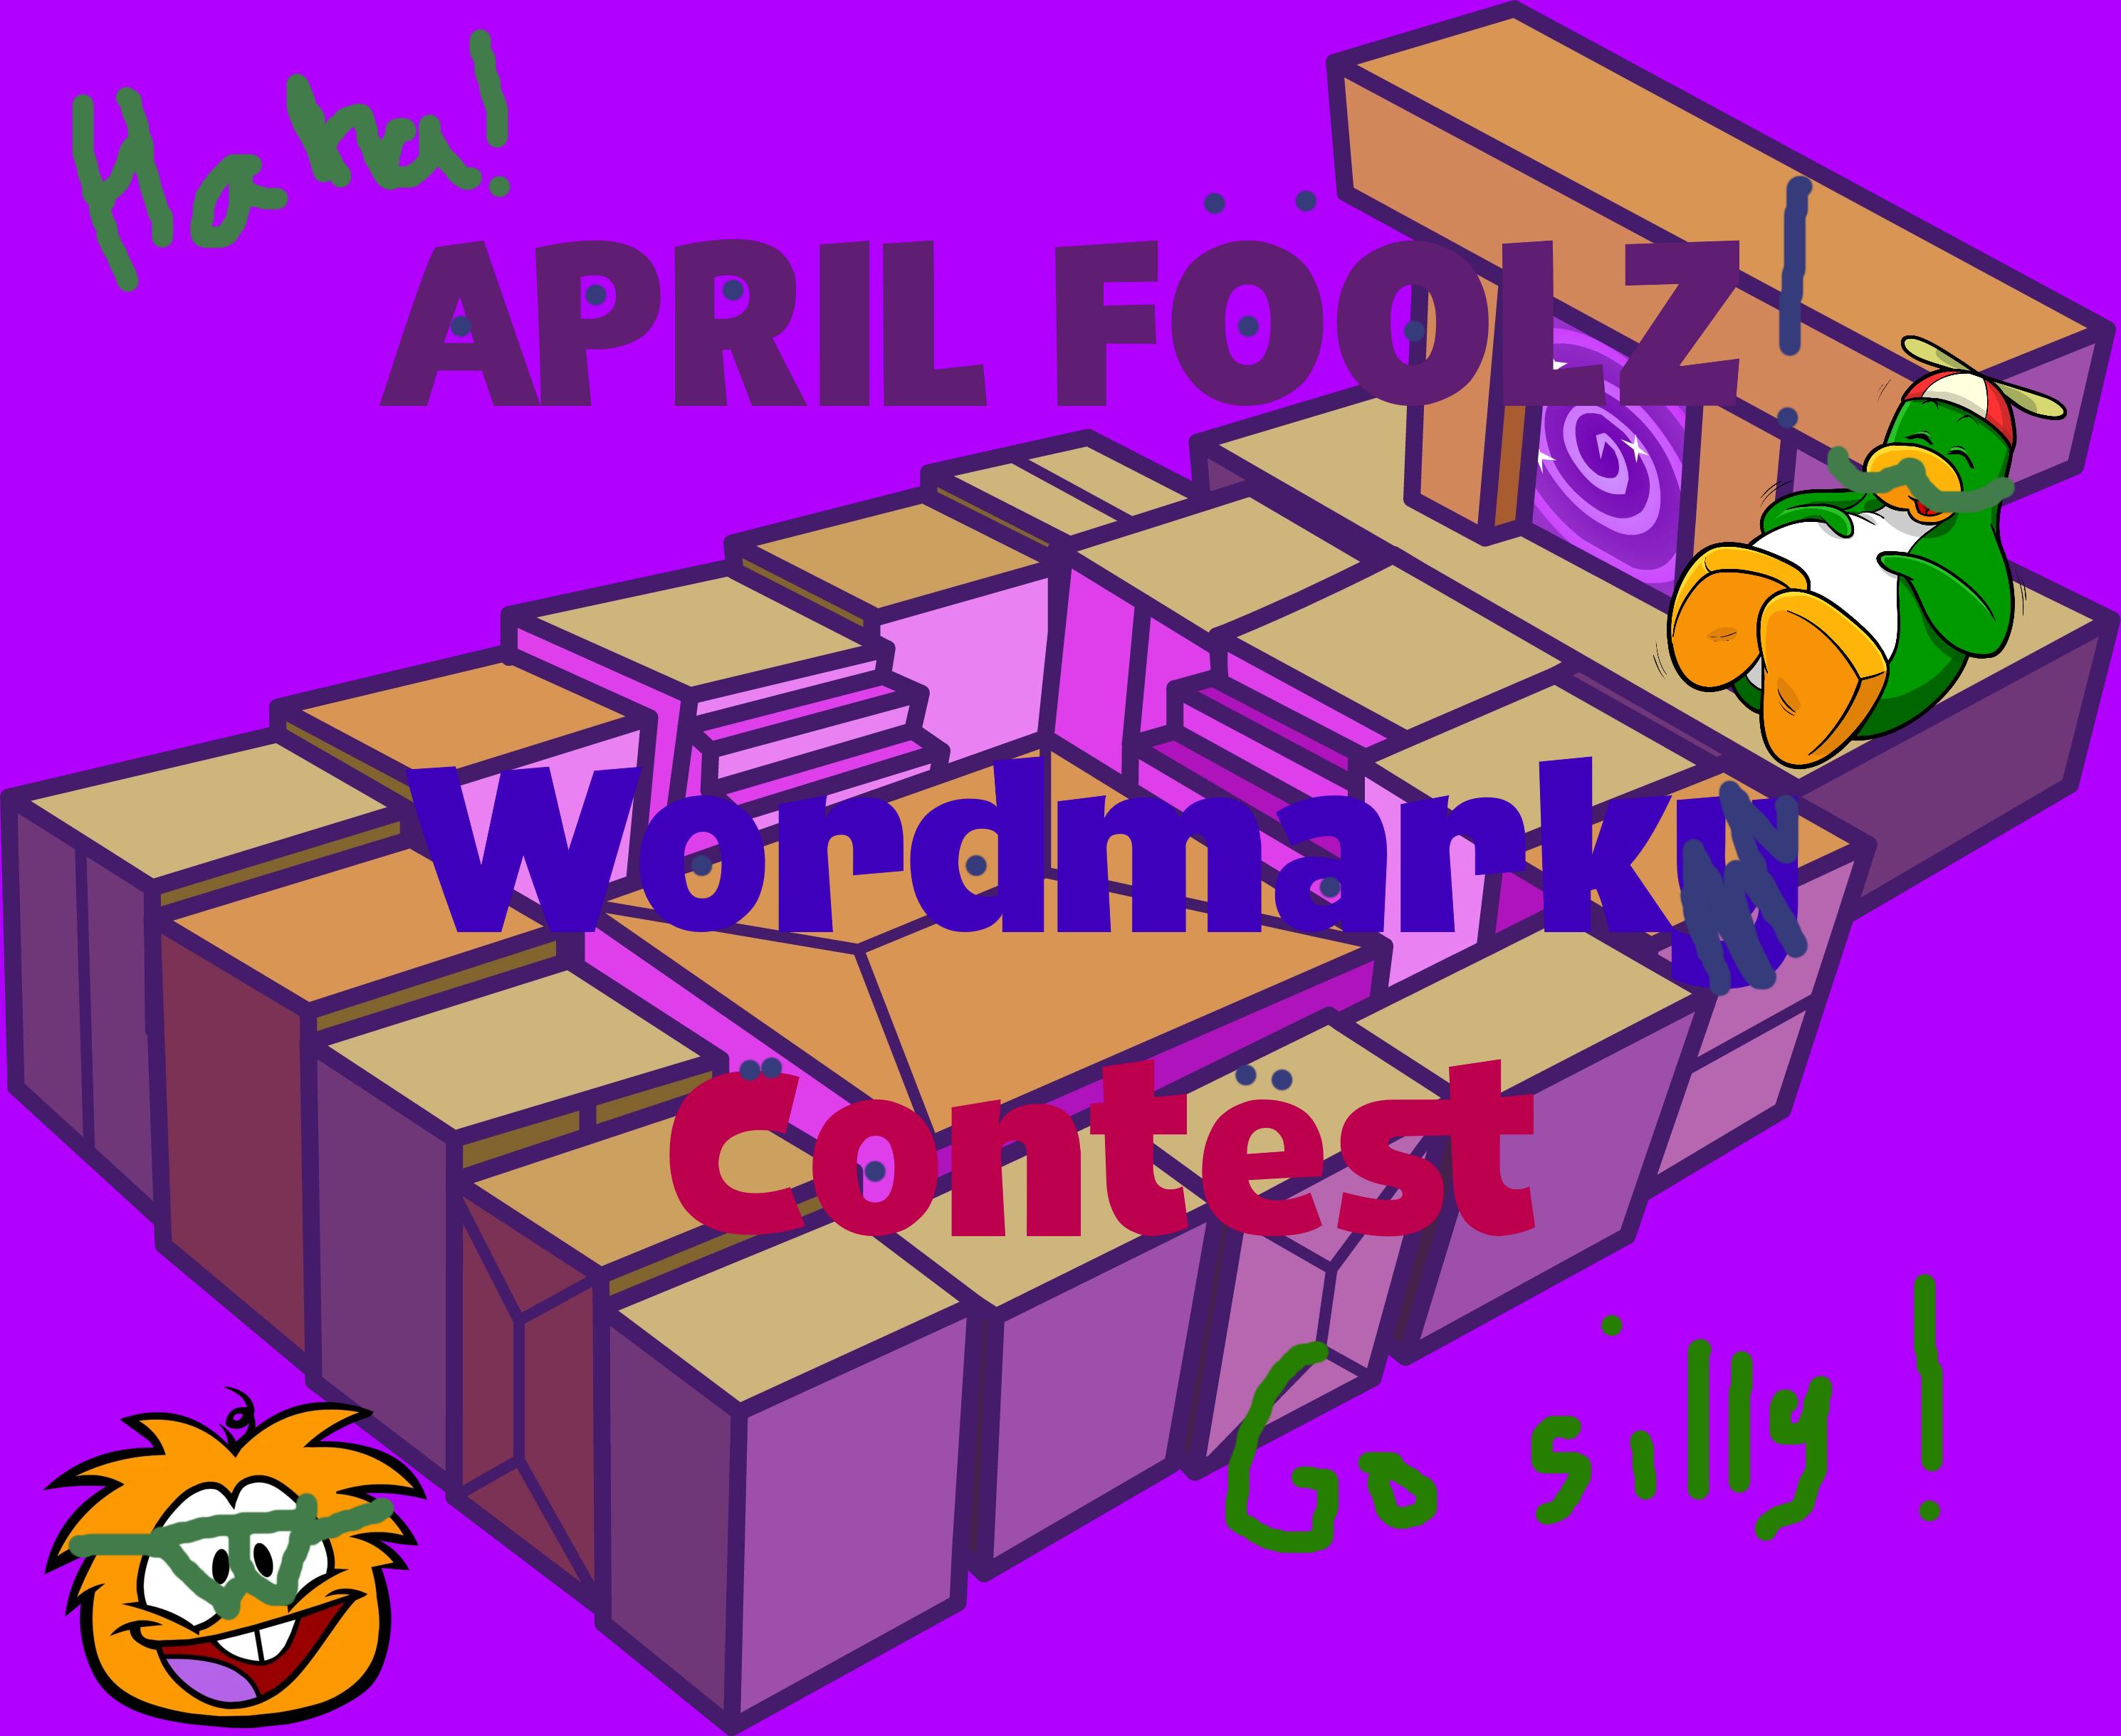 Lataus/April Fools Party 2019 Wordmark Contest!